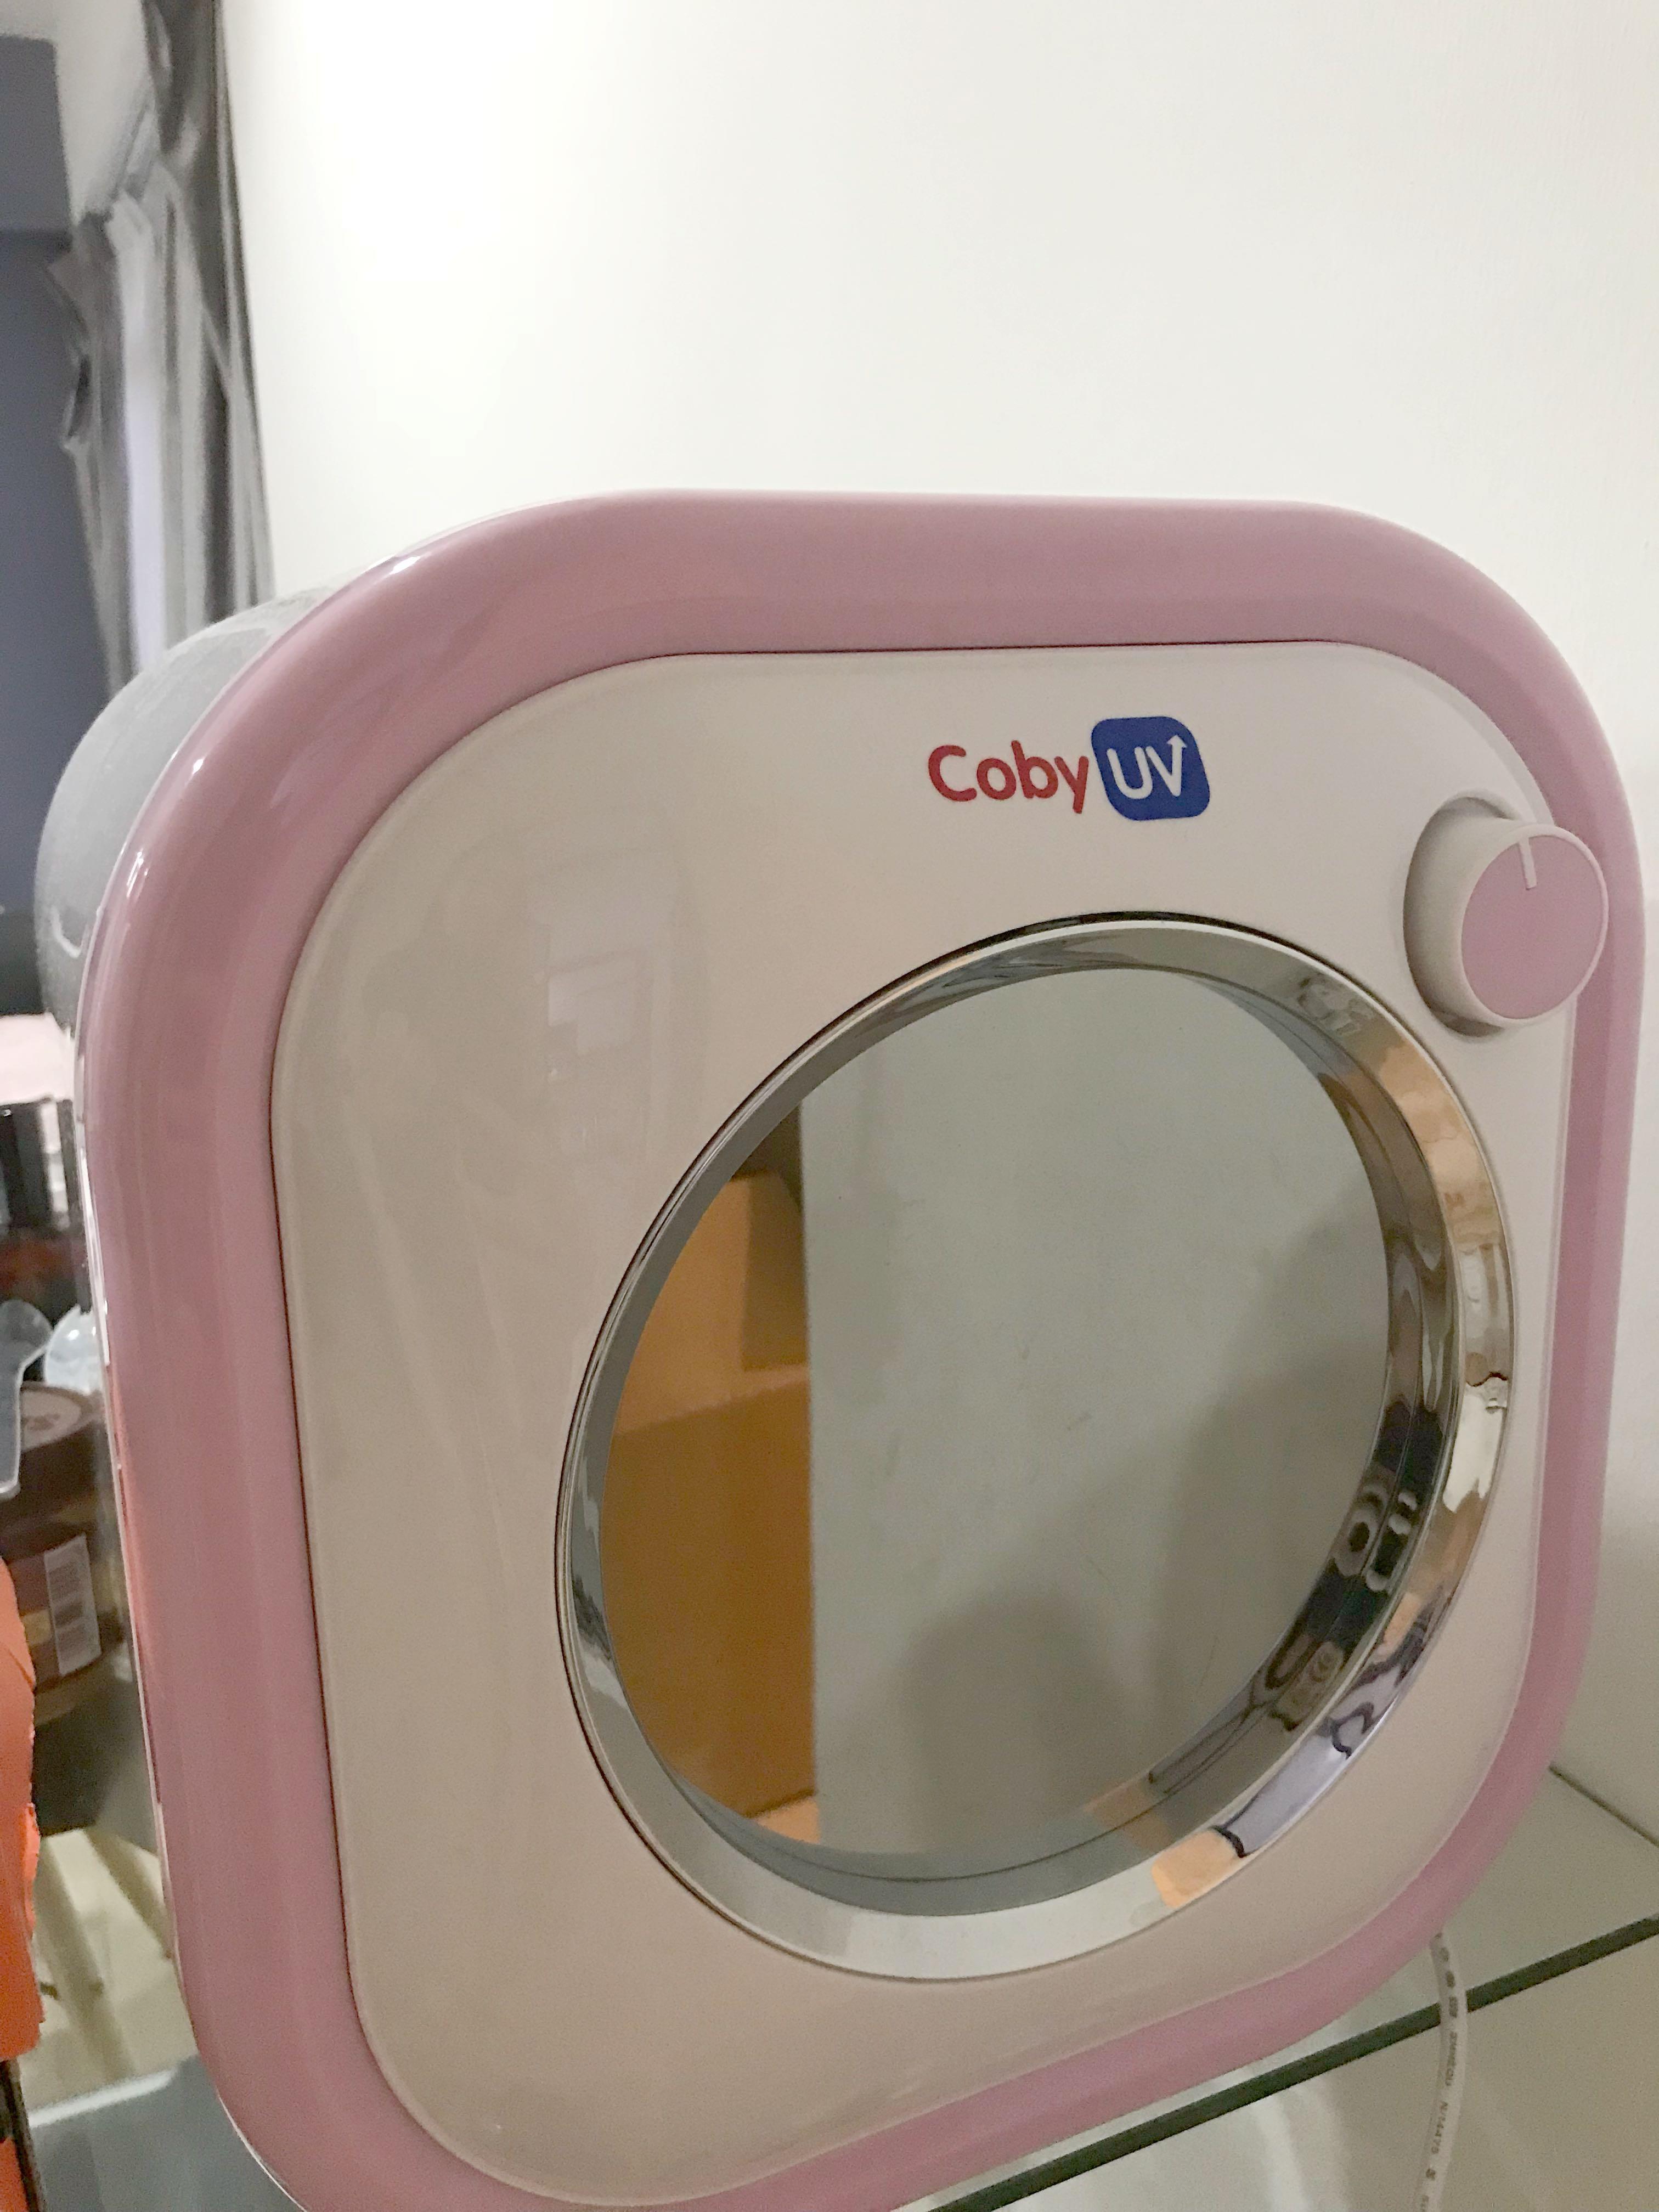 Coby uv steriliser - urgent pick up by 4th April